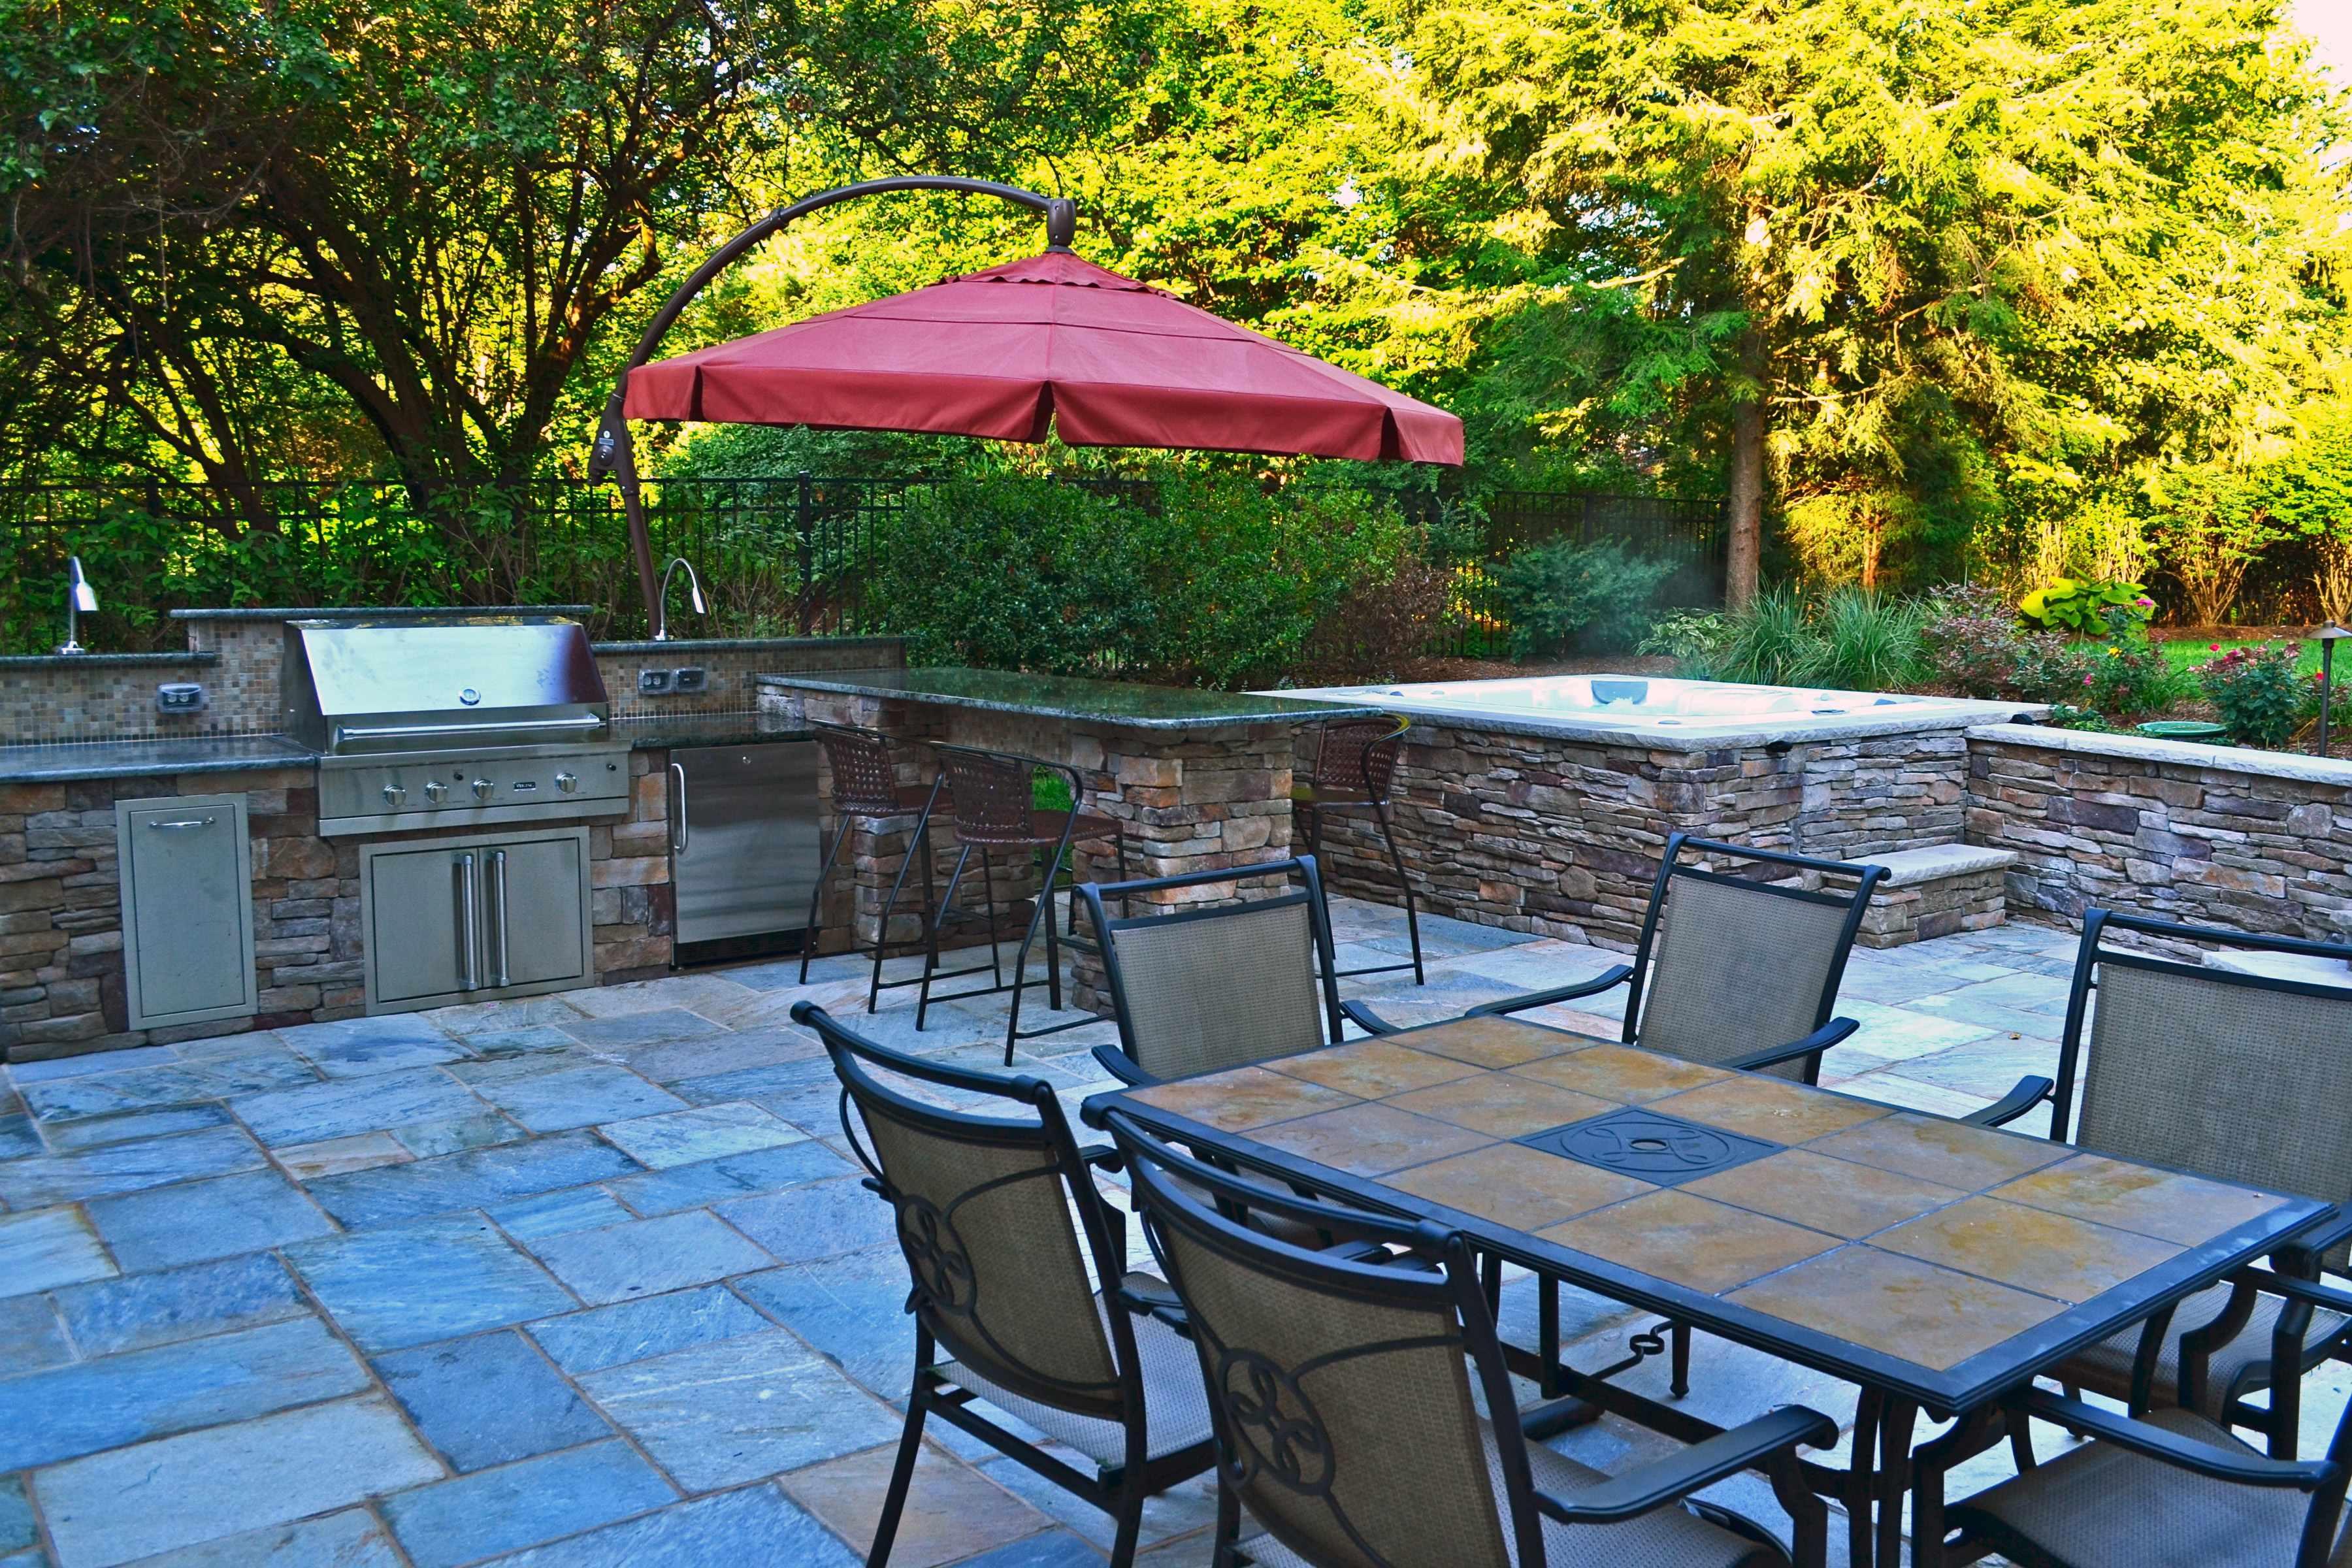 New Outdoor Kitchen Design Ideas For 2014- Bergen County NJ